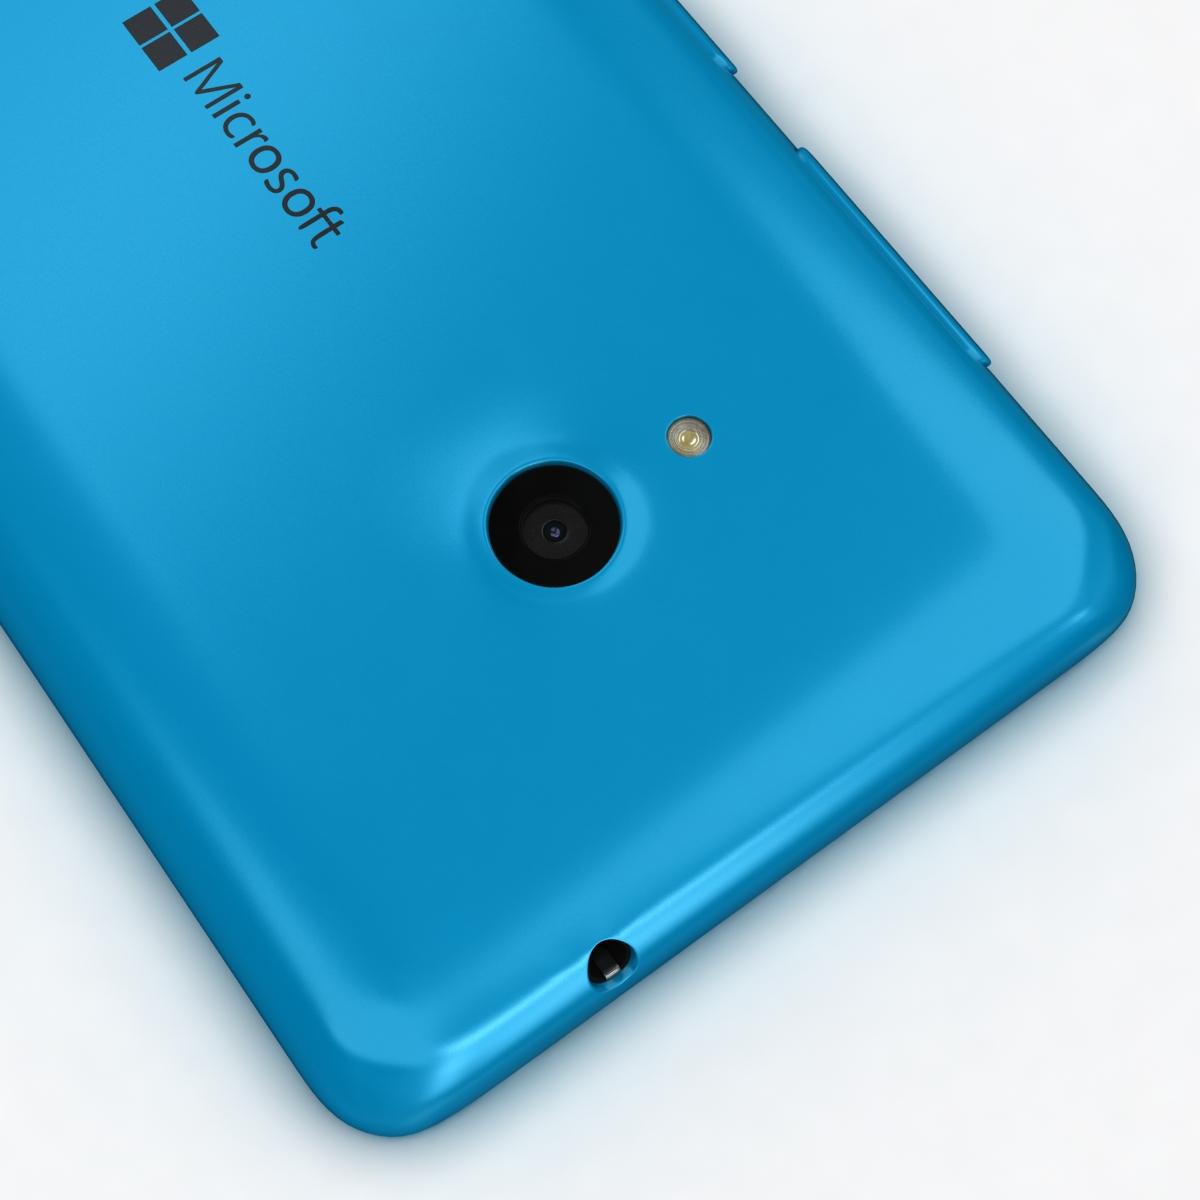 microsoft lumia 535 and dual sim blue 3d model 3ds max fbx c4d obj 204528